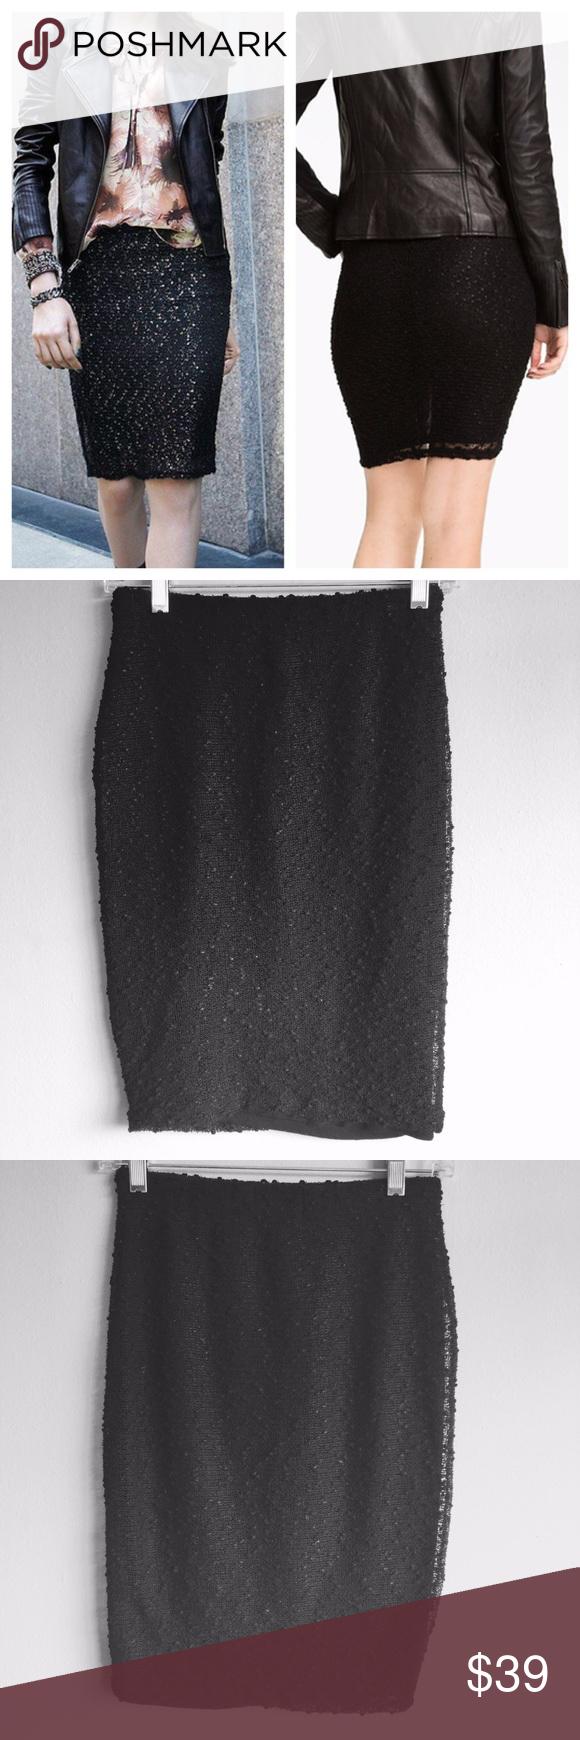 Selling this $99 NWOT XS Sanctuary Boucle Pencil Skirt Black on Poshmark! My username is: deh_sale. #shopmycloset #poshmark #fashion #shopping #style #forsale #Sanctuary #Dresses & Skirts